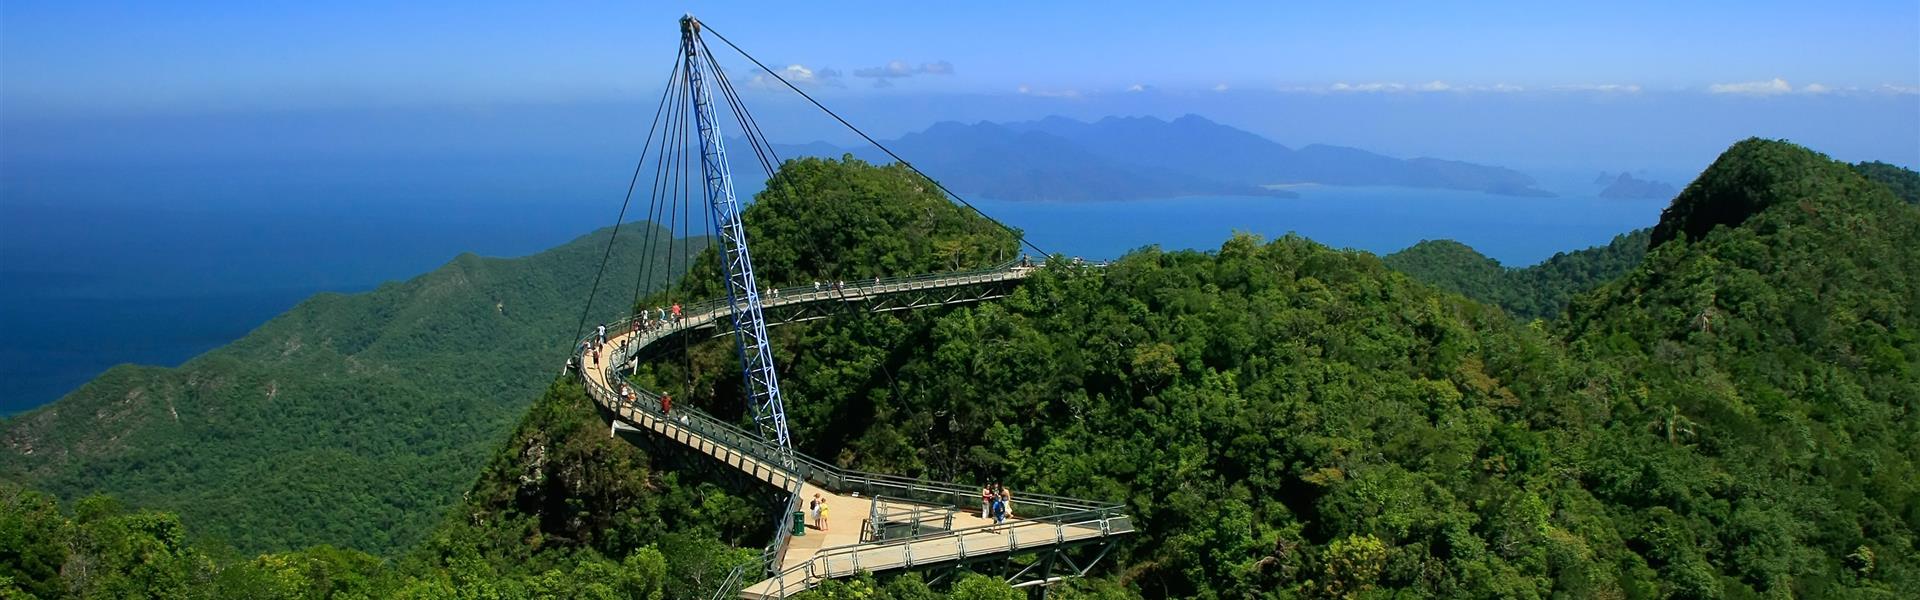 Malajsie -